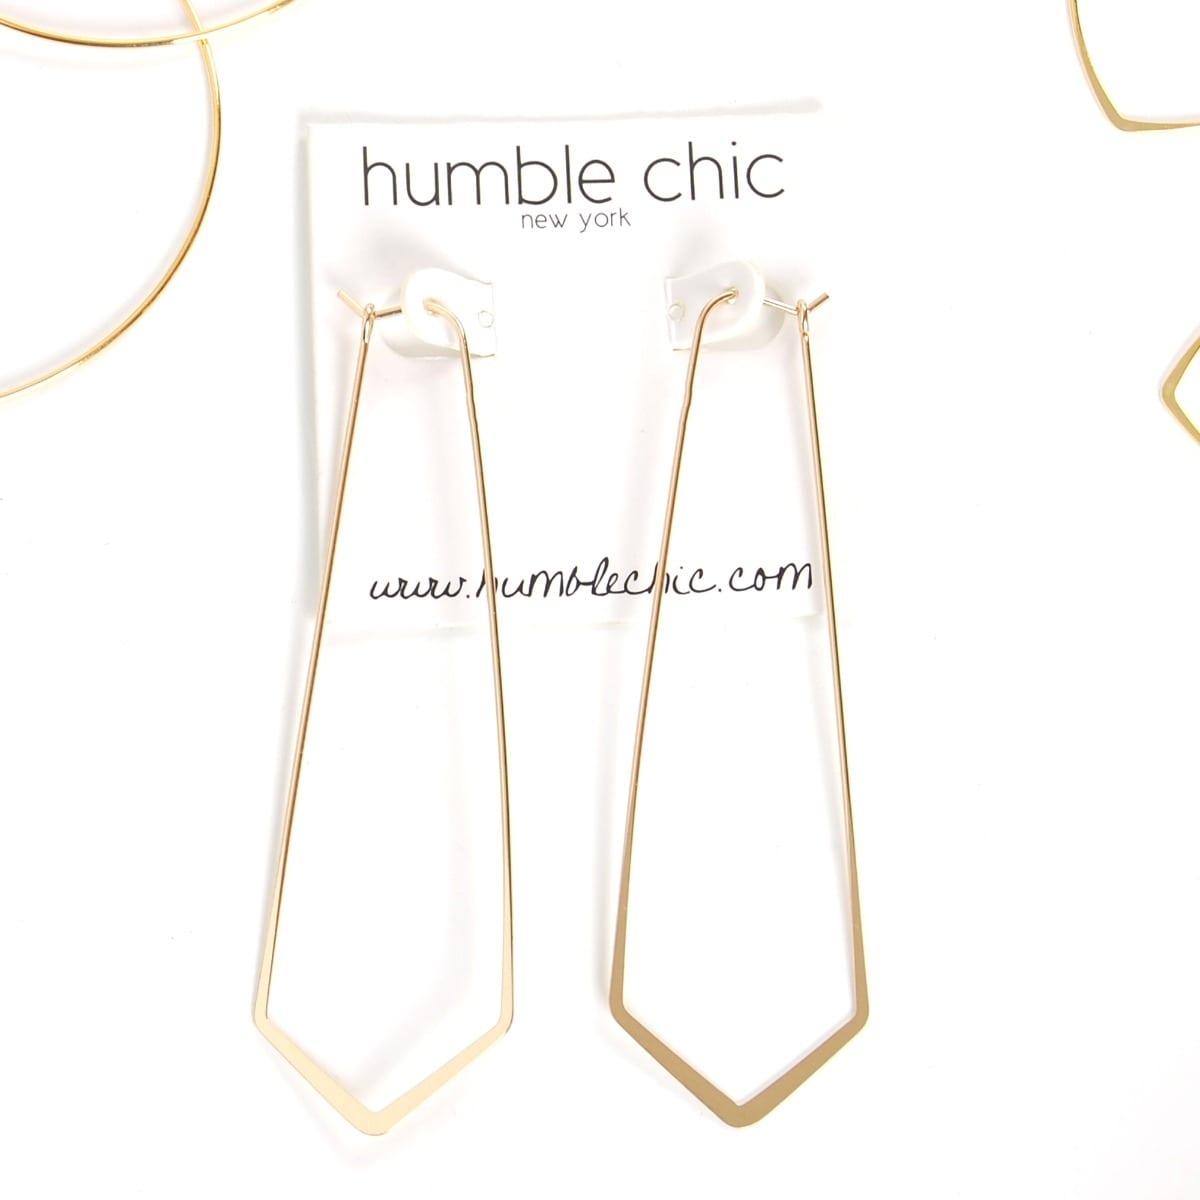 7d569fb3bb41e Humble Chic Geometric Chevron Threader Hoop Earrings - Lightweight Cutout  Thin Wire Drop Dangles